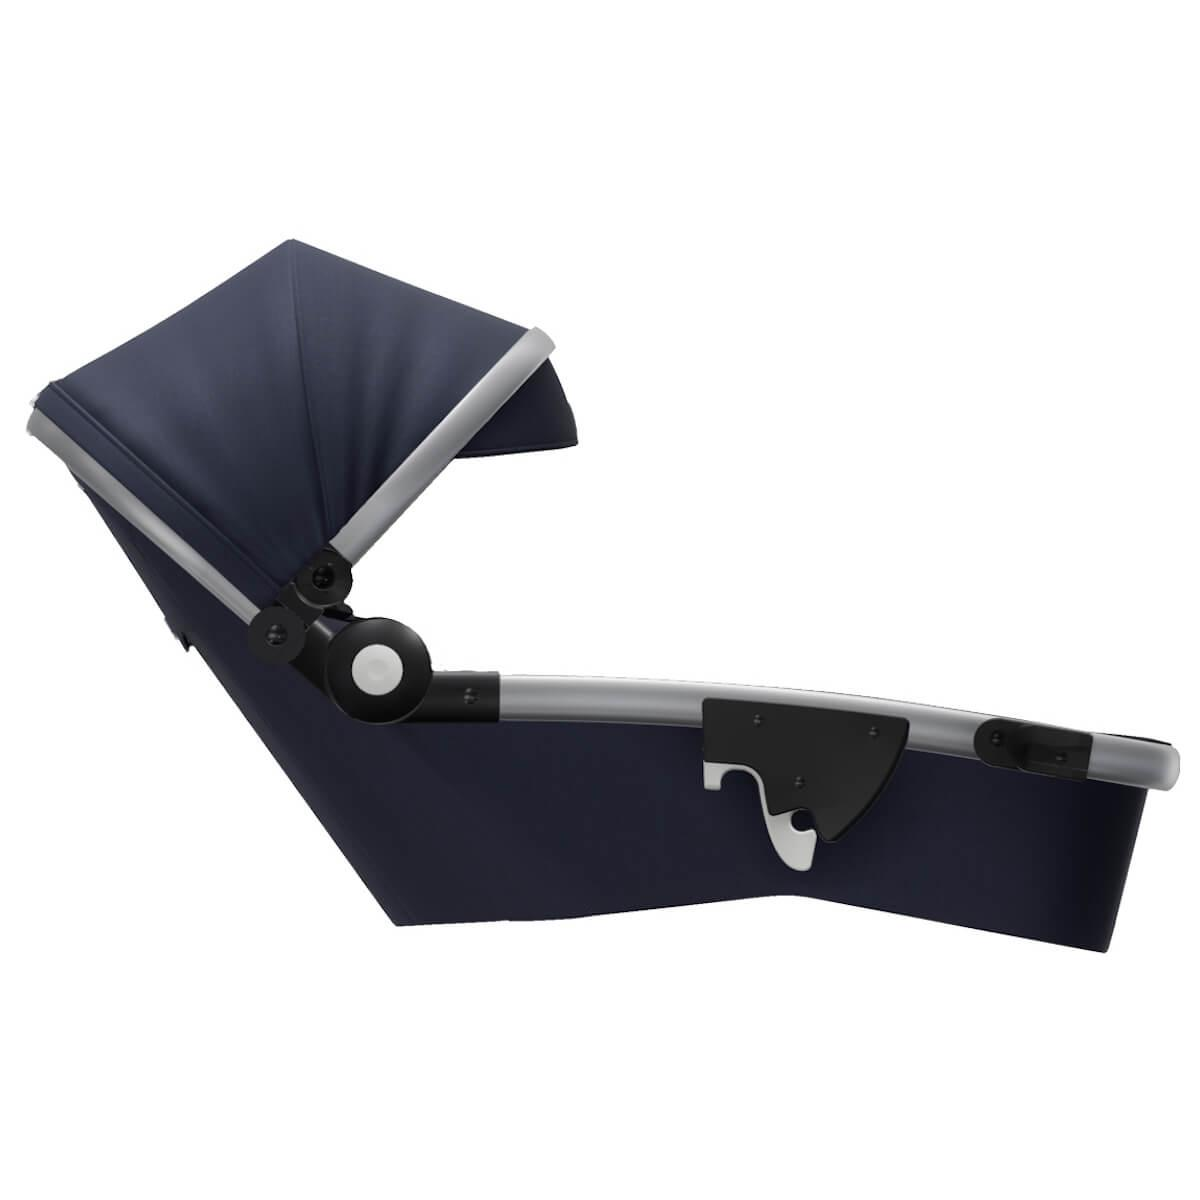 Kit d'extension assise supplémentaire GEO² Joolz Classic blue